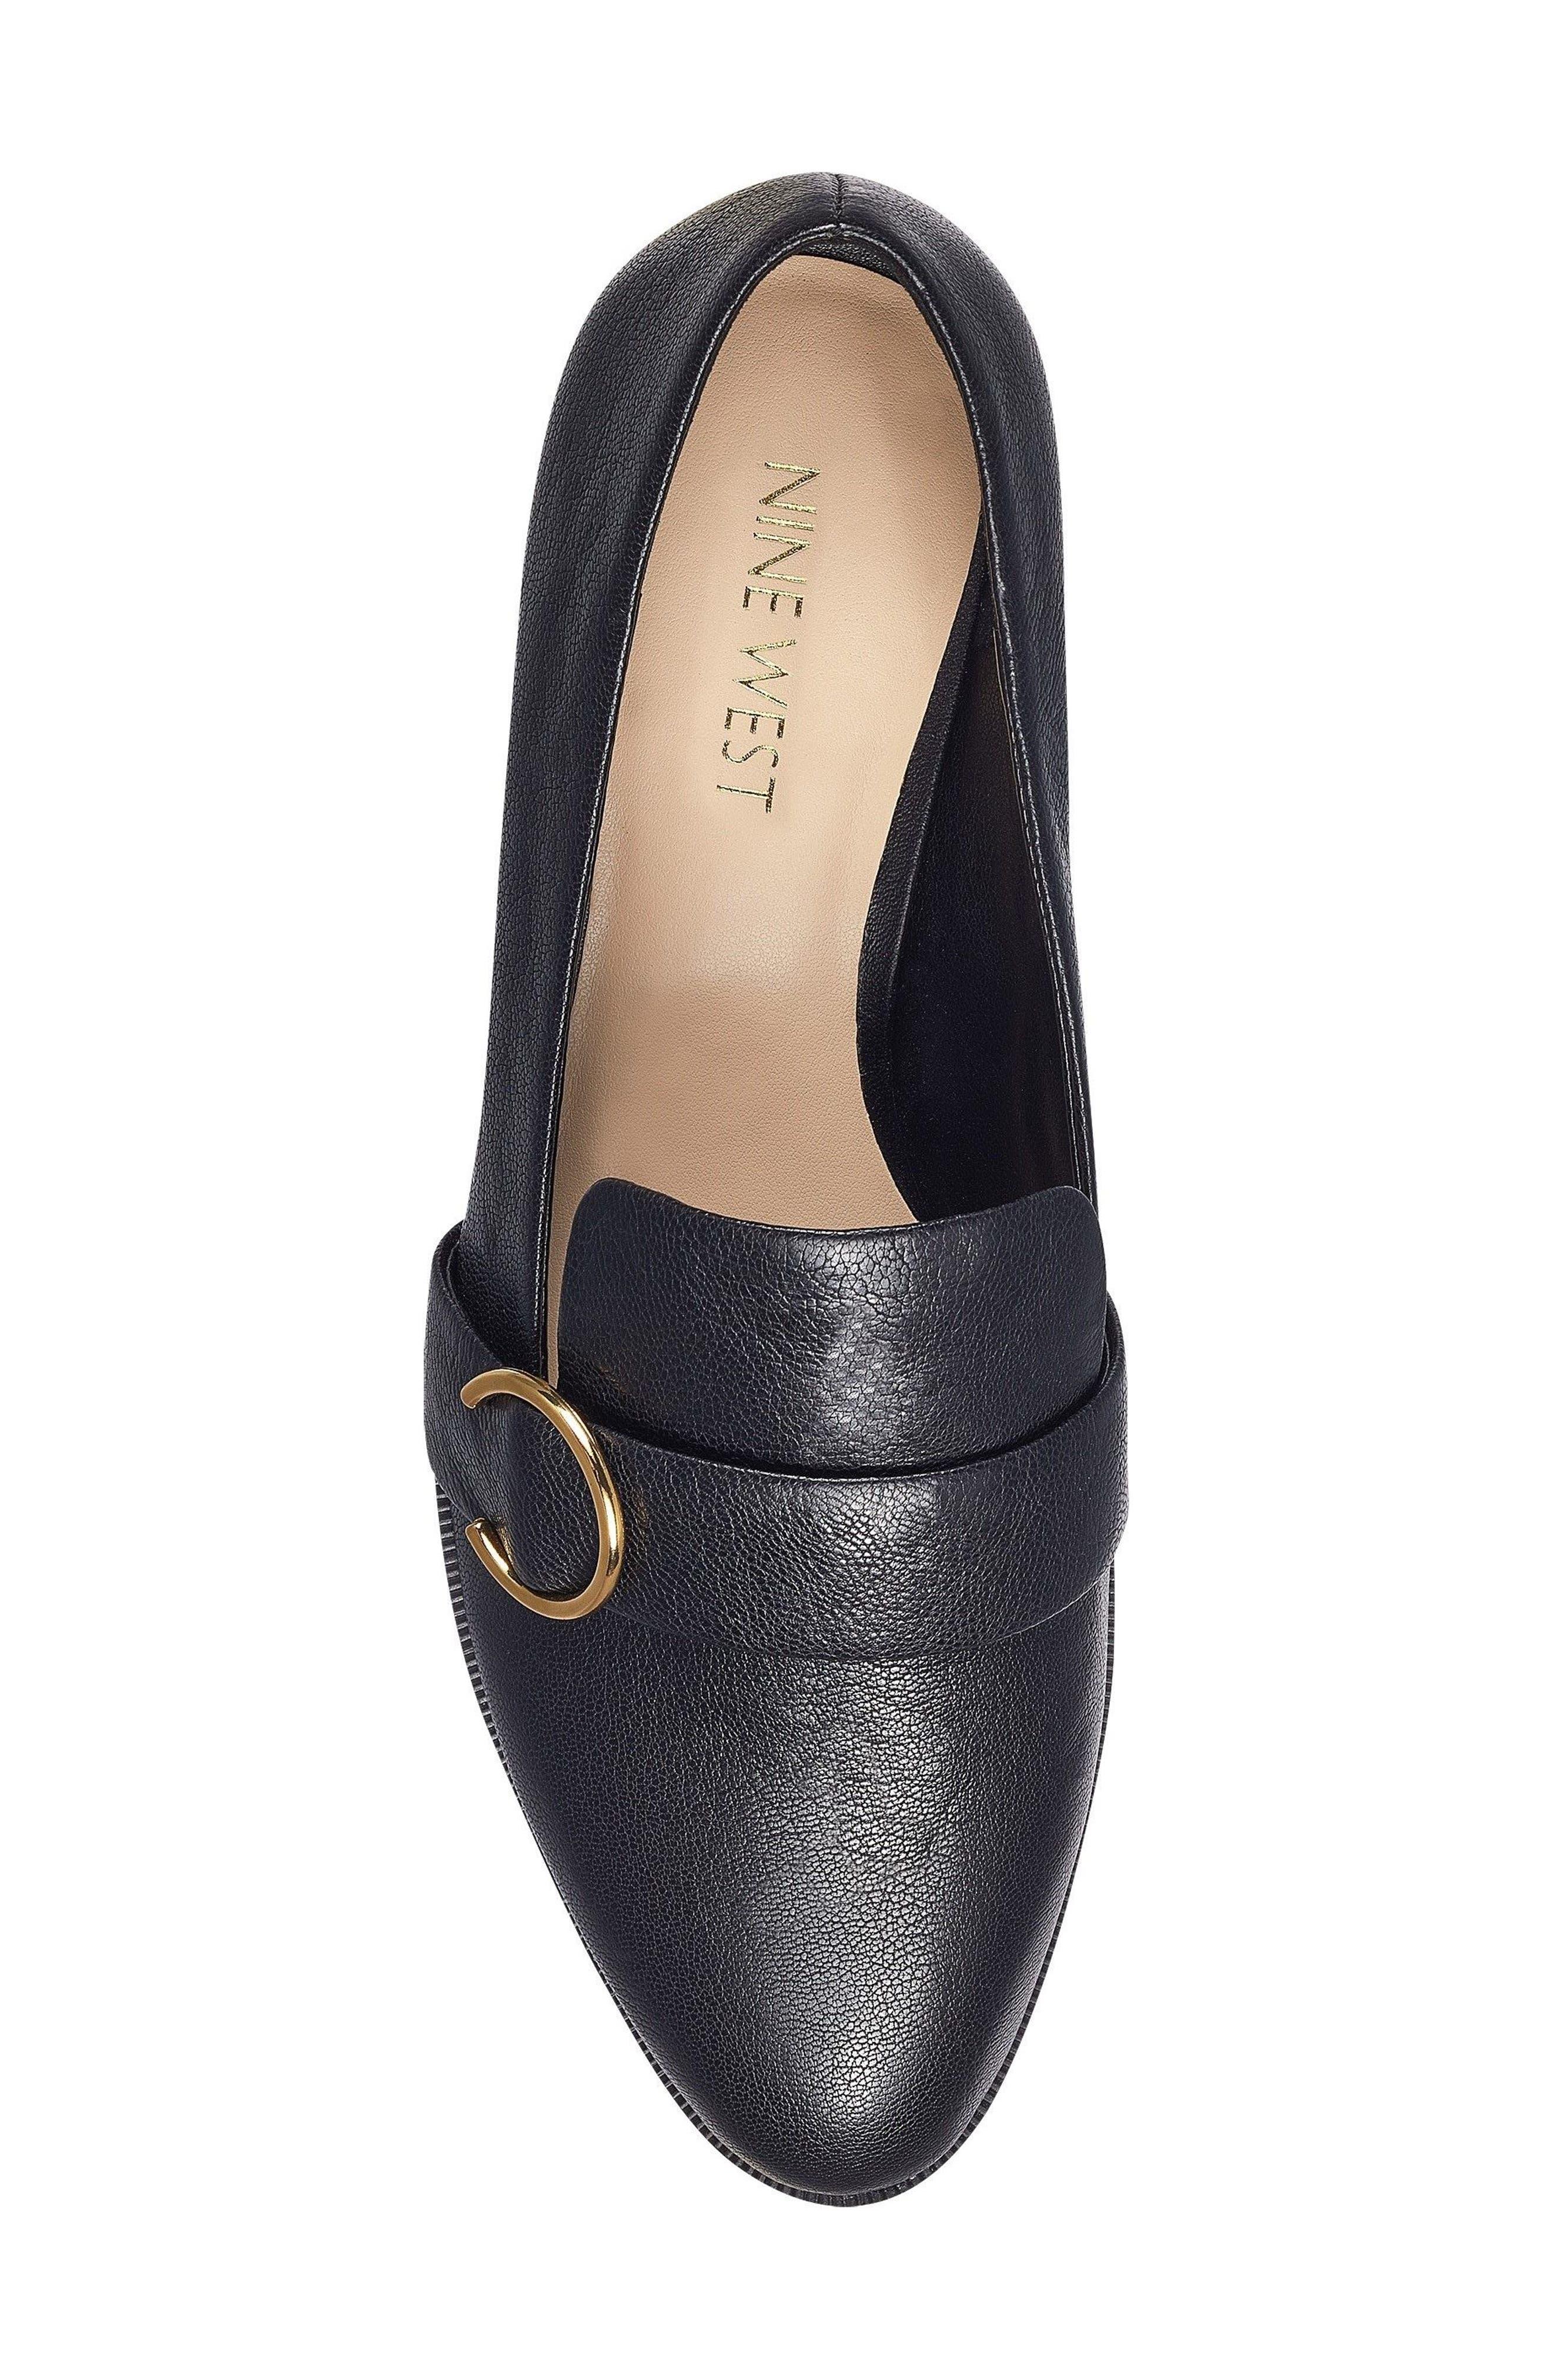 Huff Loafer Flat,                             Alternate thumbnail 5, color,                             Black Leather